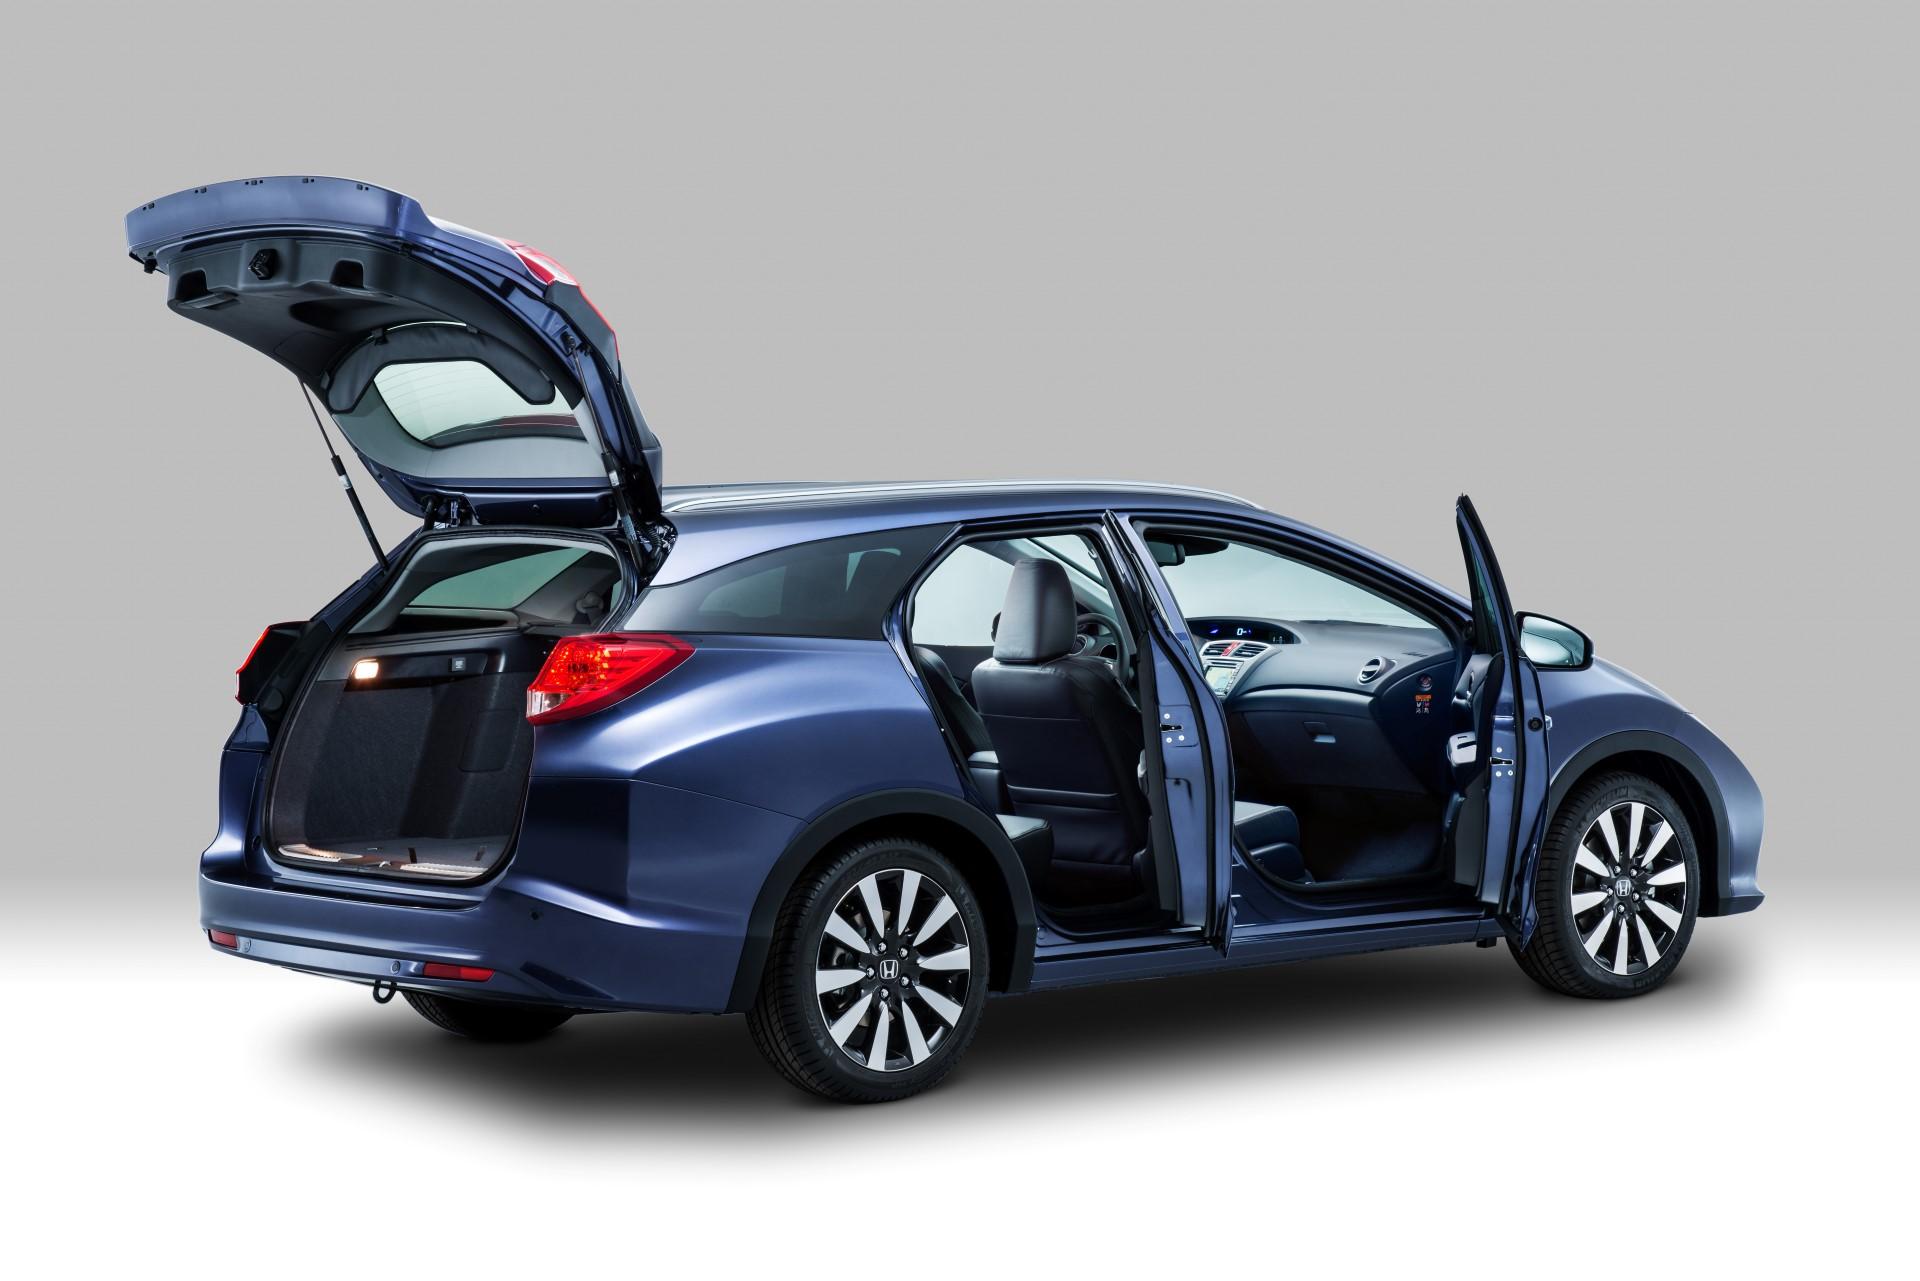 Хонда Цивик Тюнер представлен официально